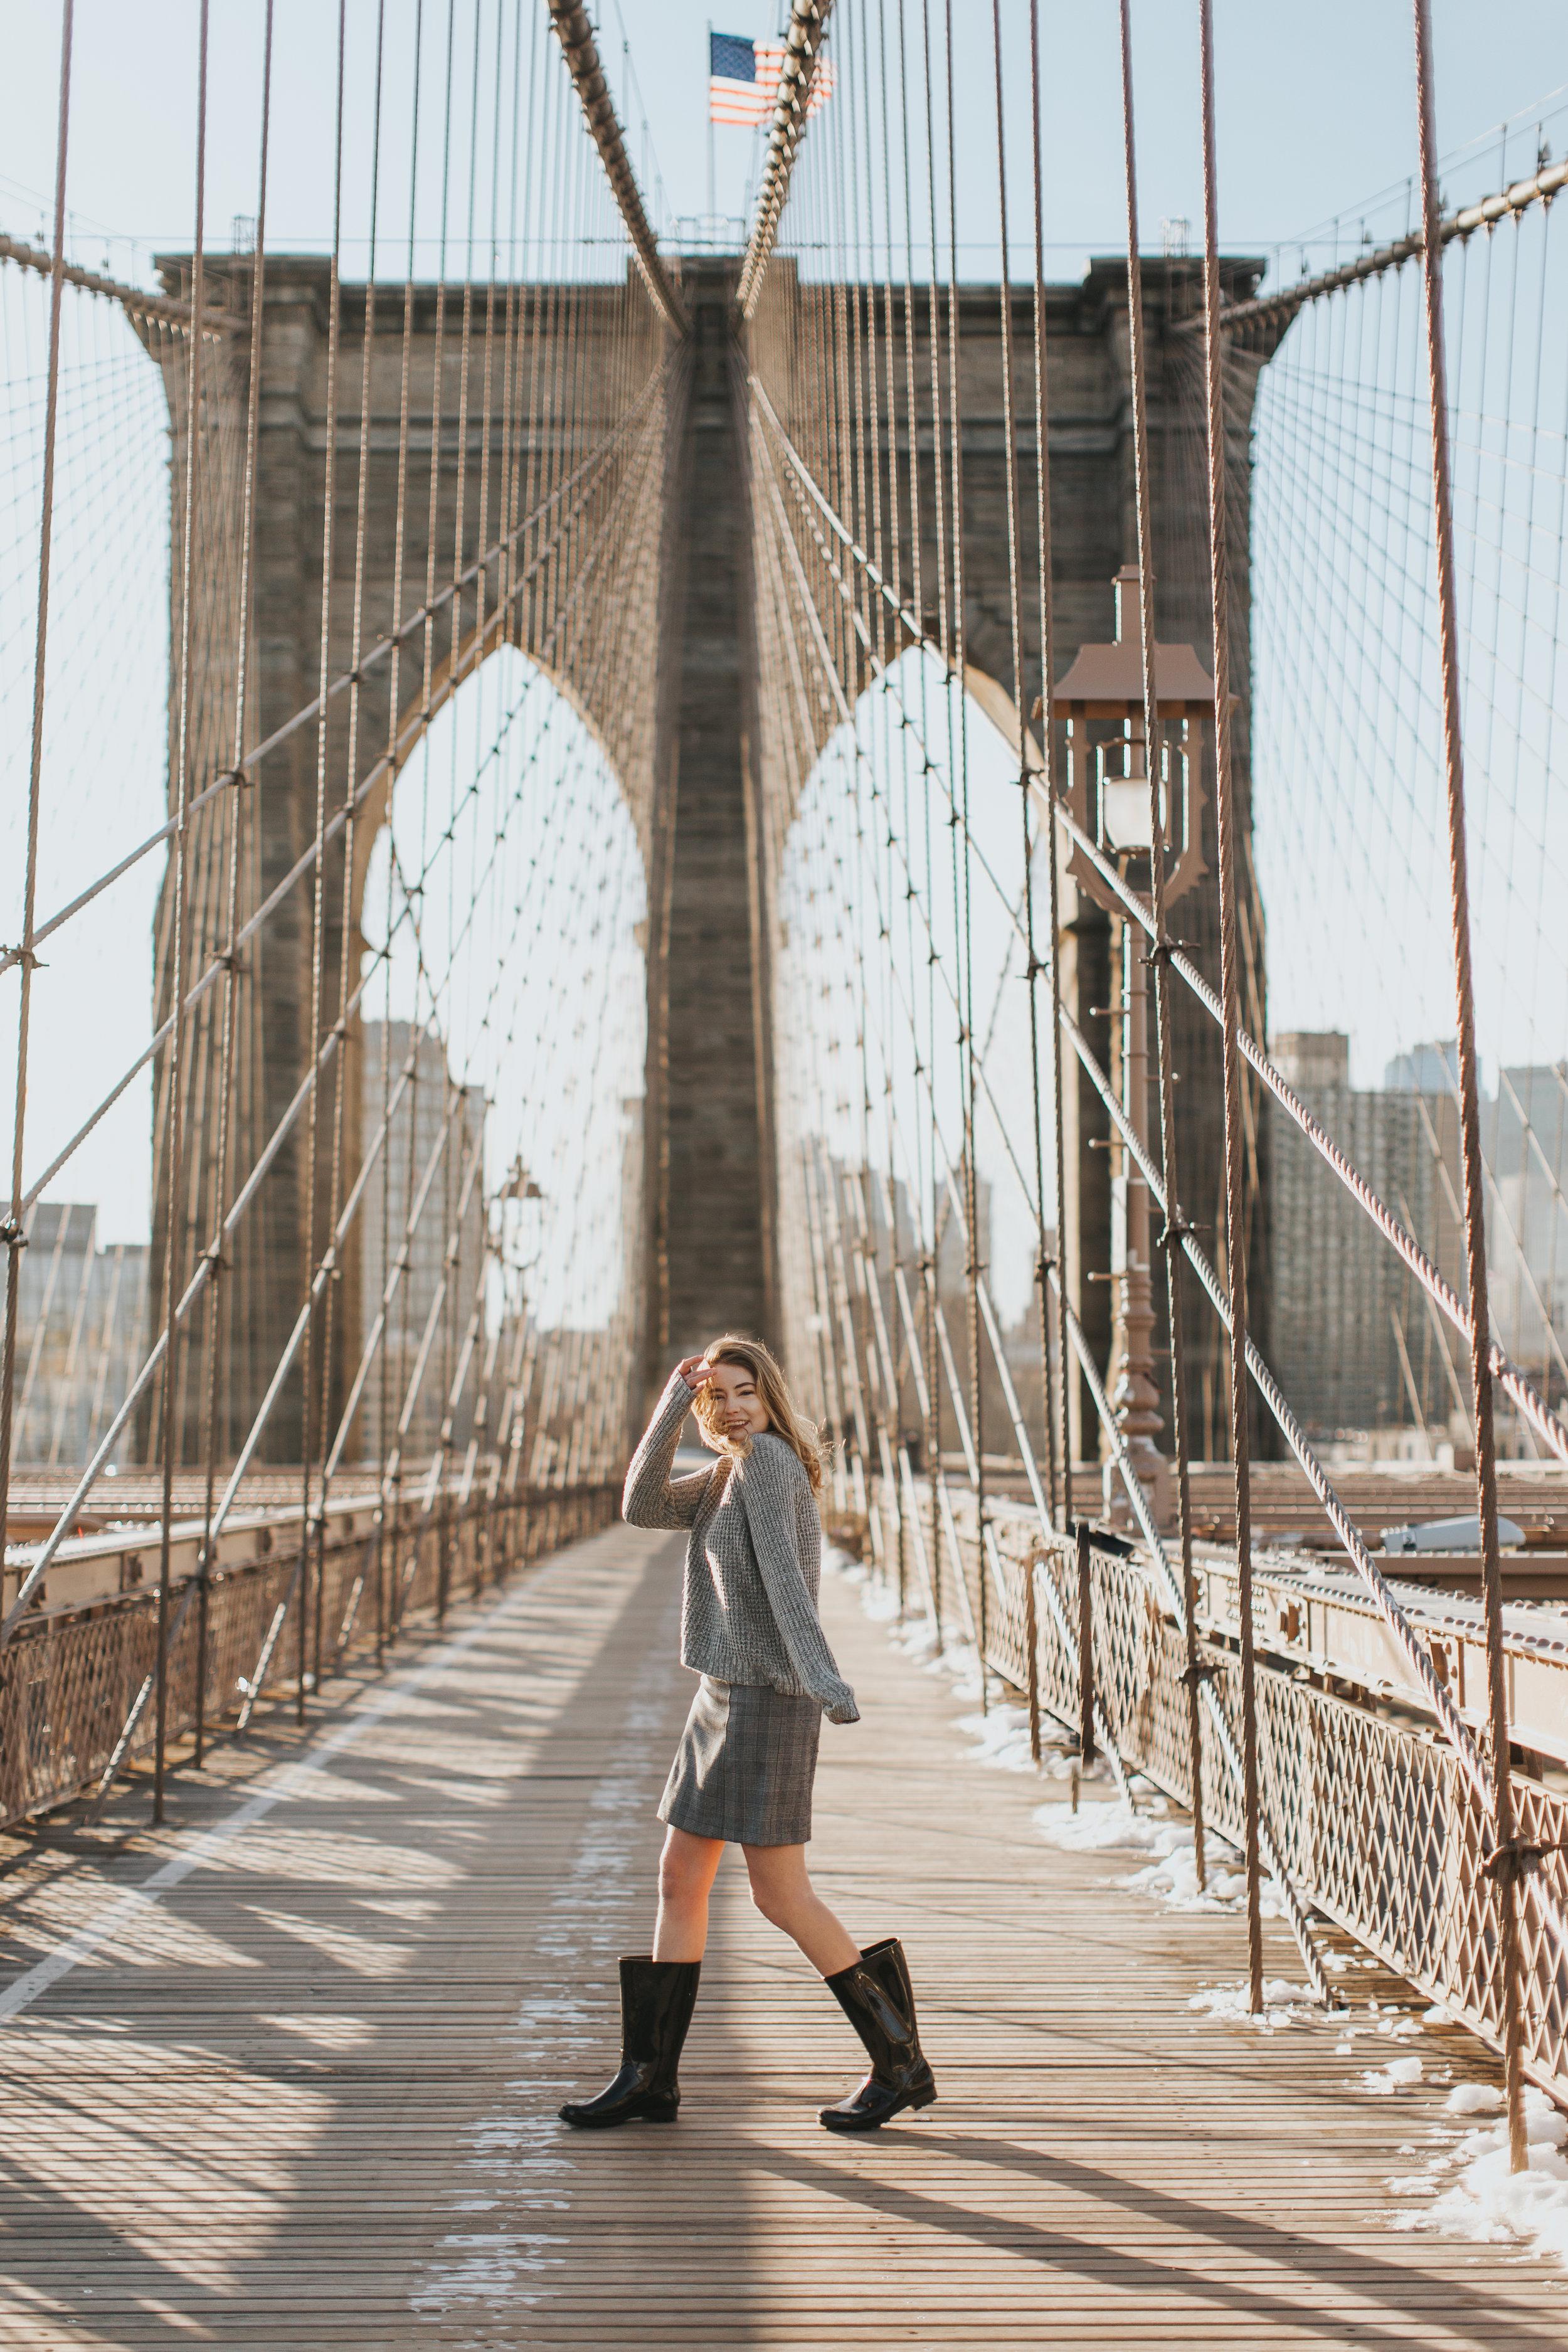 New York City portrait photographer, New york city wedding photographer, Brooklyn bridge portrait, brooklyn bridge photos, brooklyn bridge sunrise session, Brooklyn bridge inspiration514.JPG